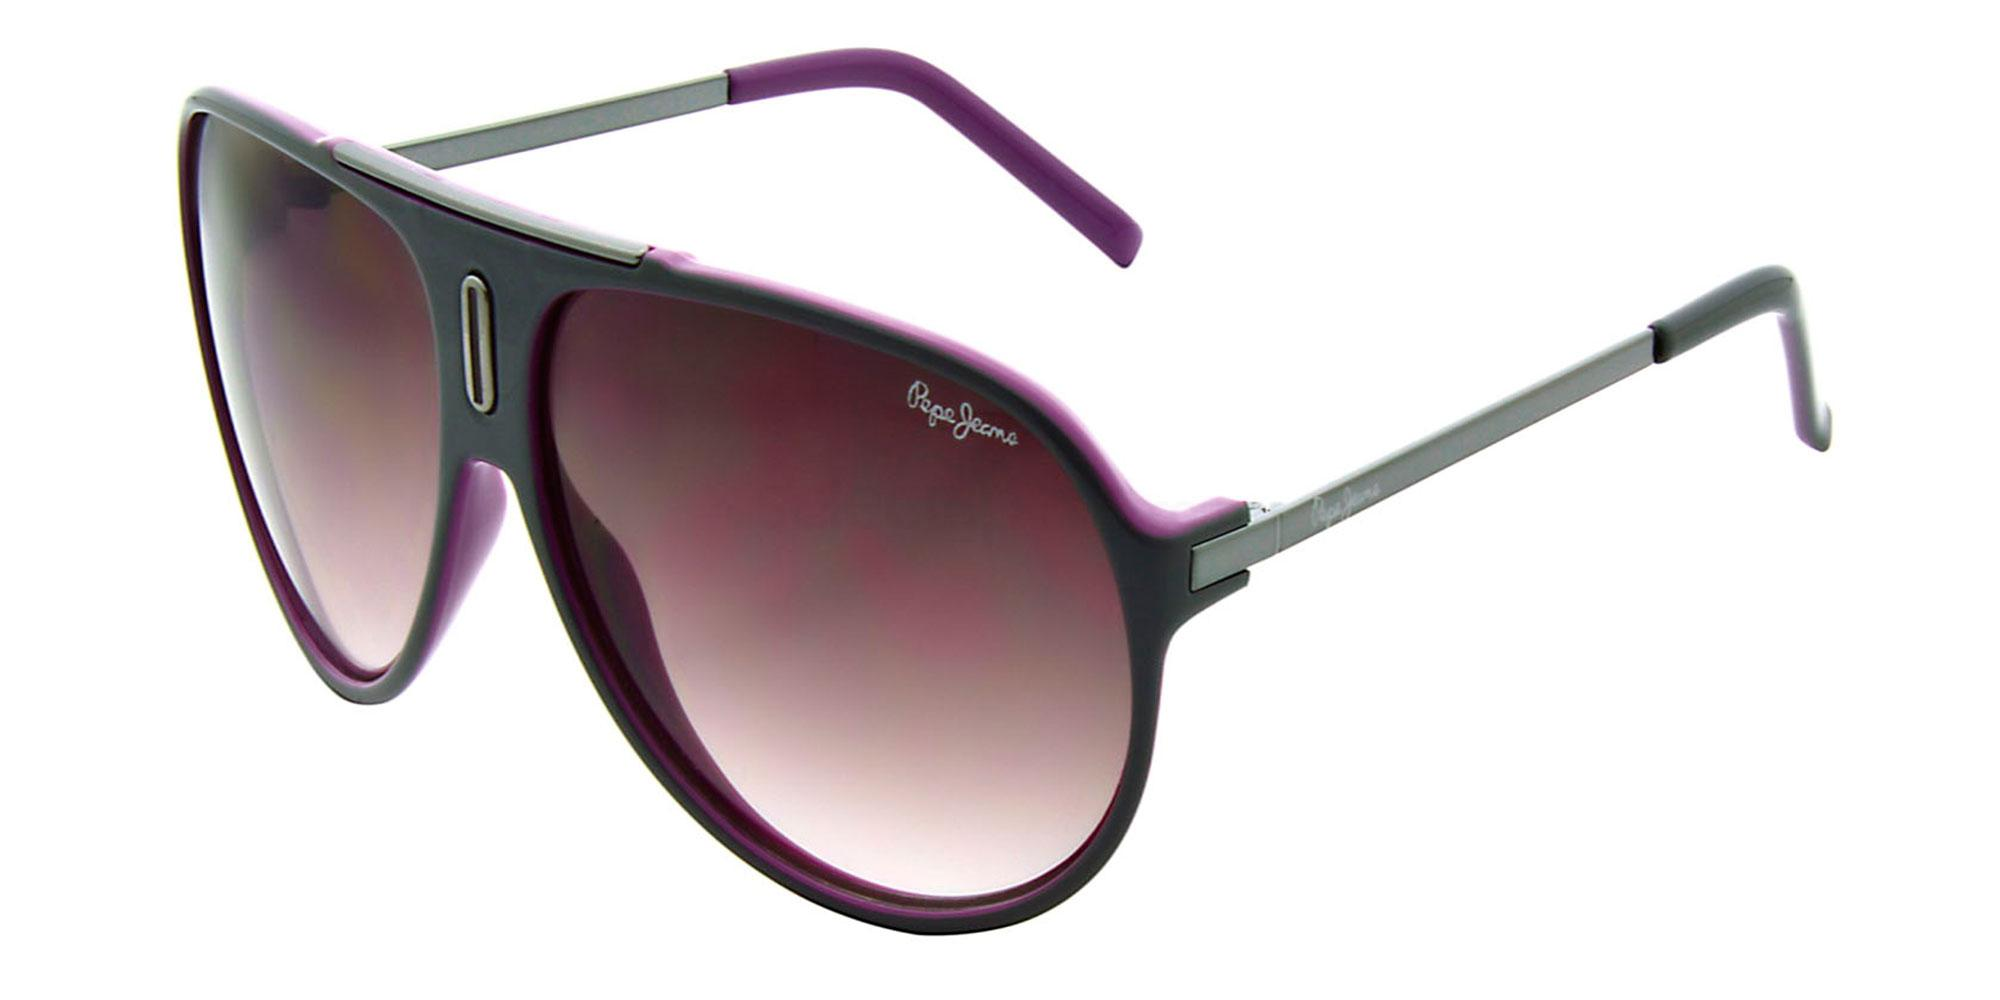 C4 PJ7155 Sunglasses, Pepe Jeans London